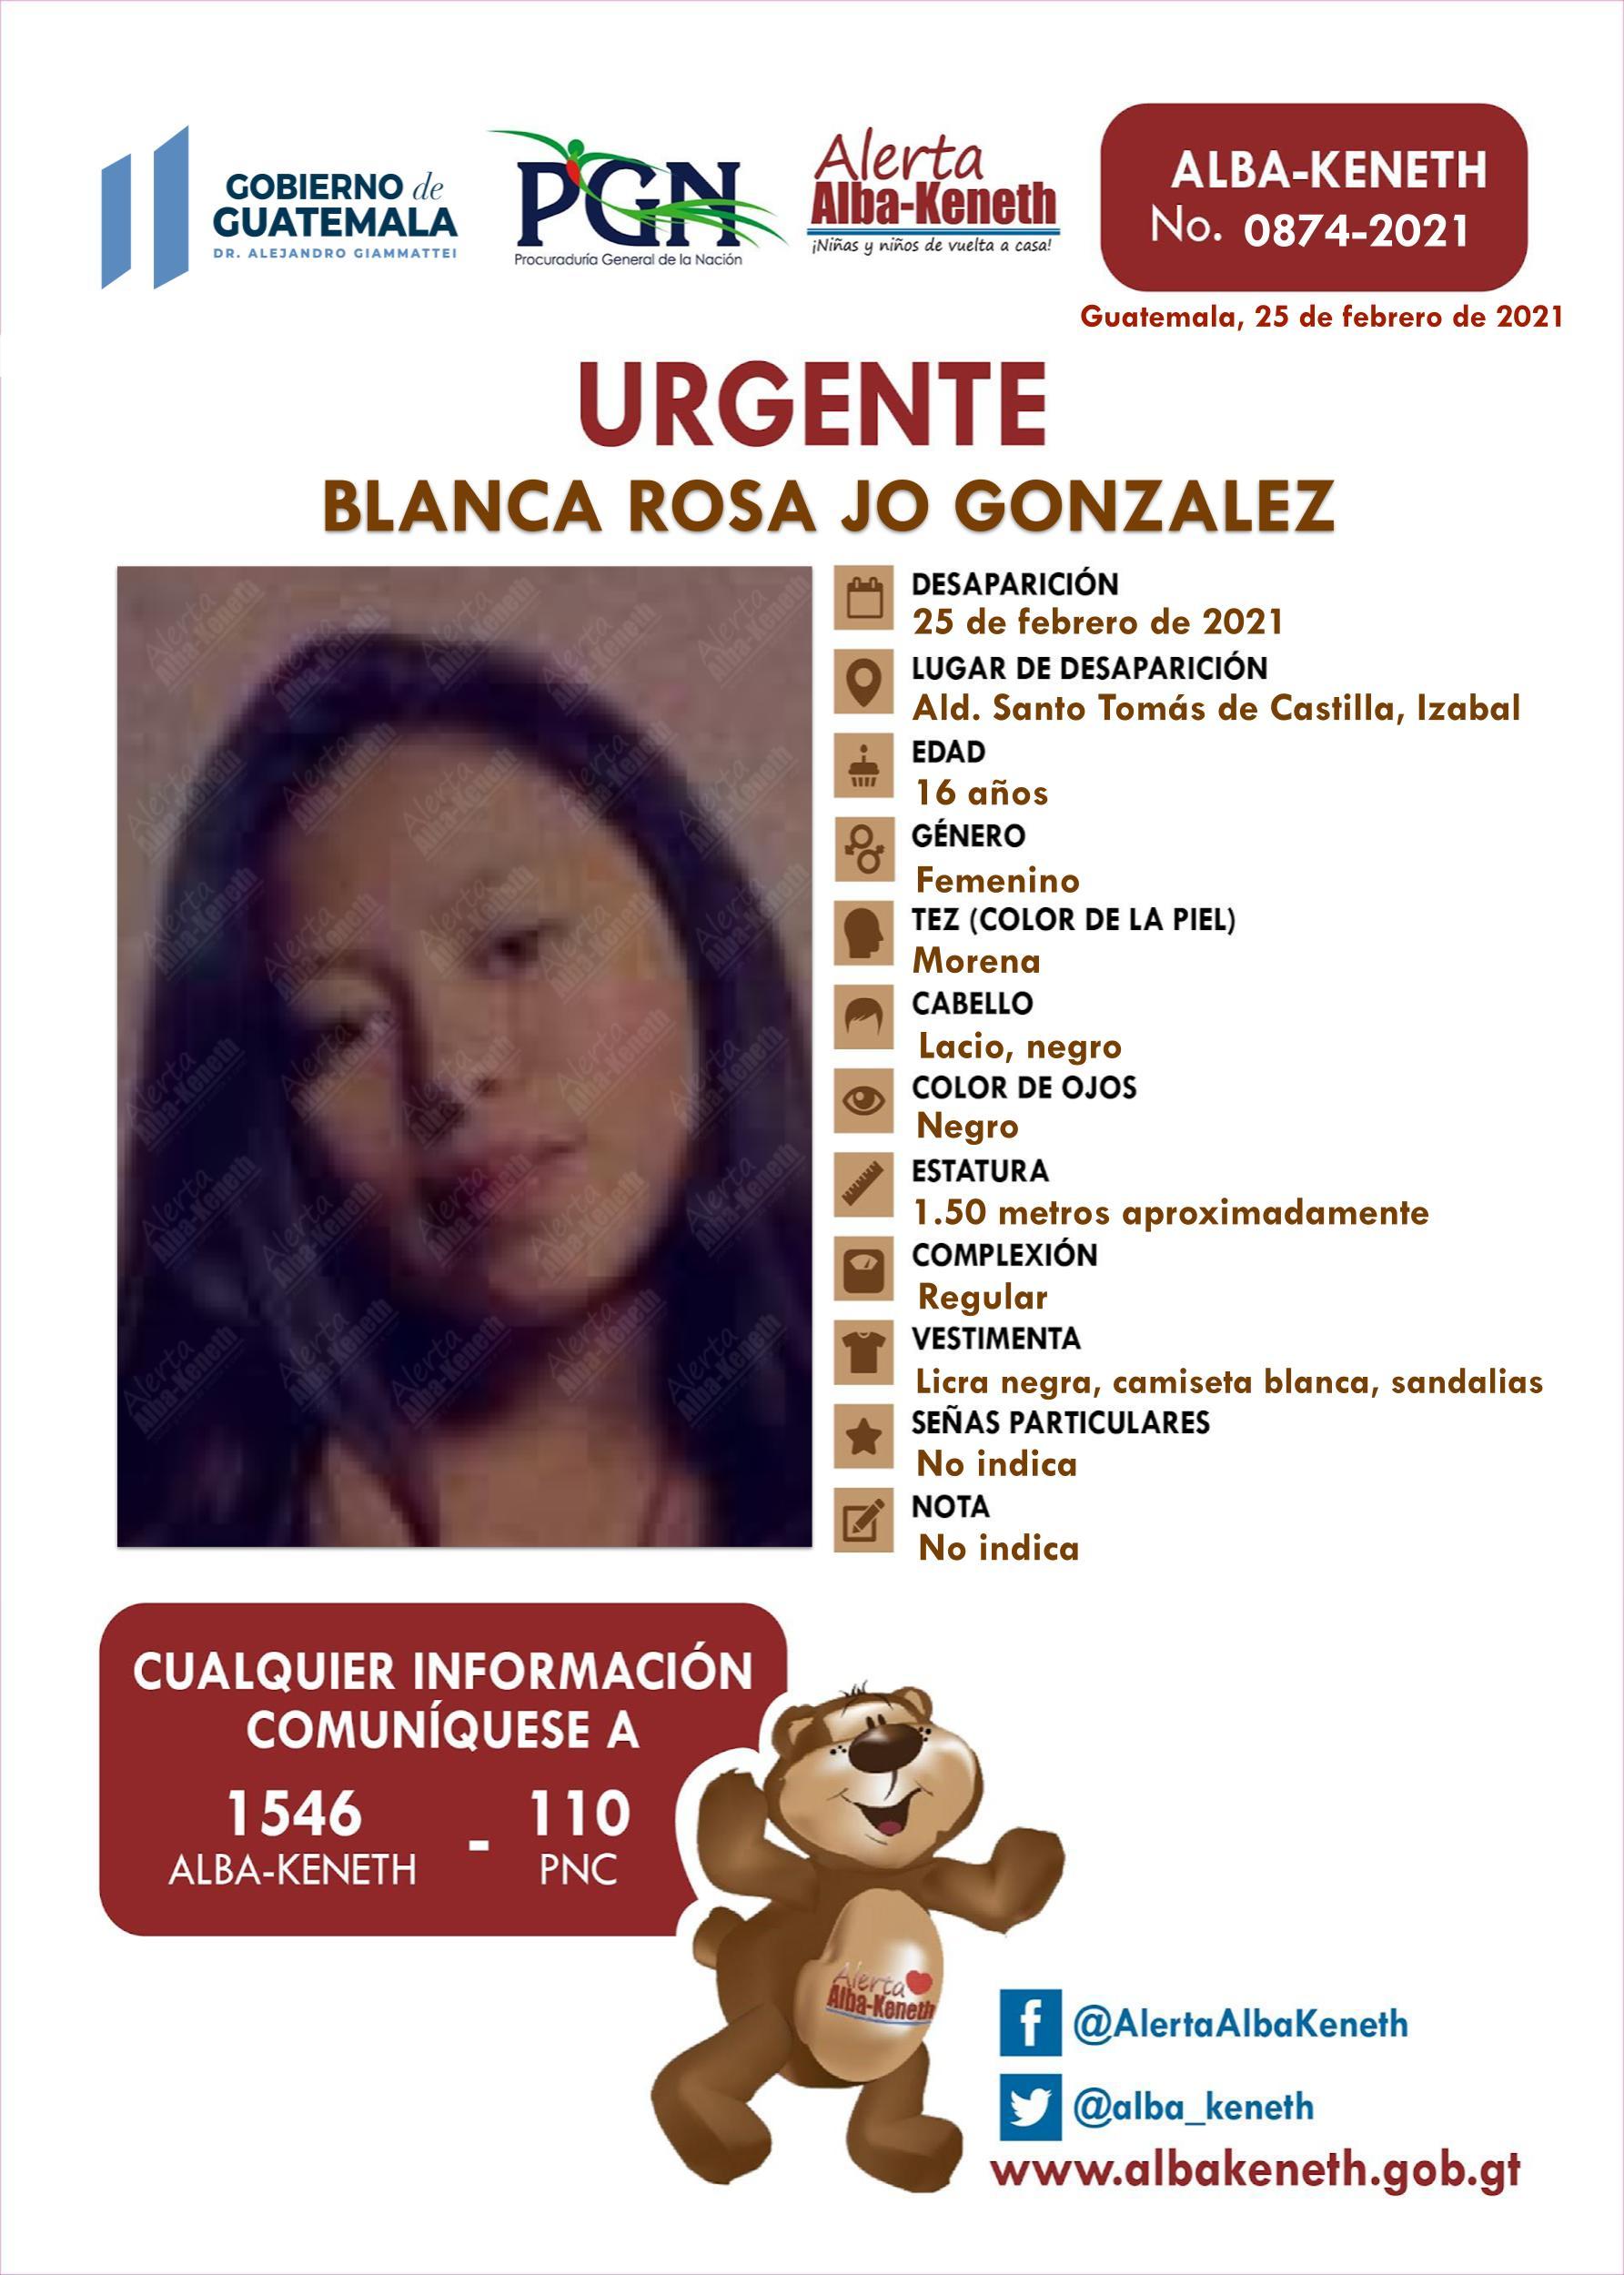 Blanca Rosa Jo Gonzalez